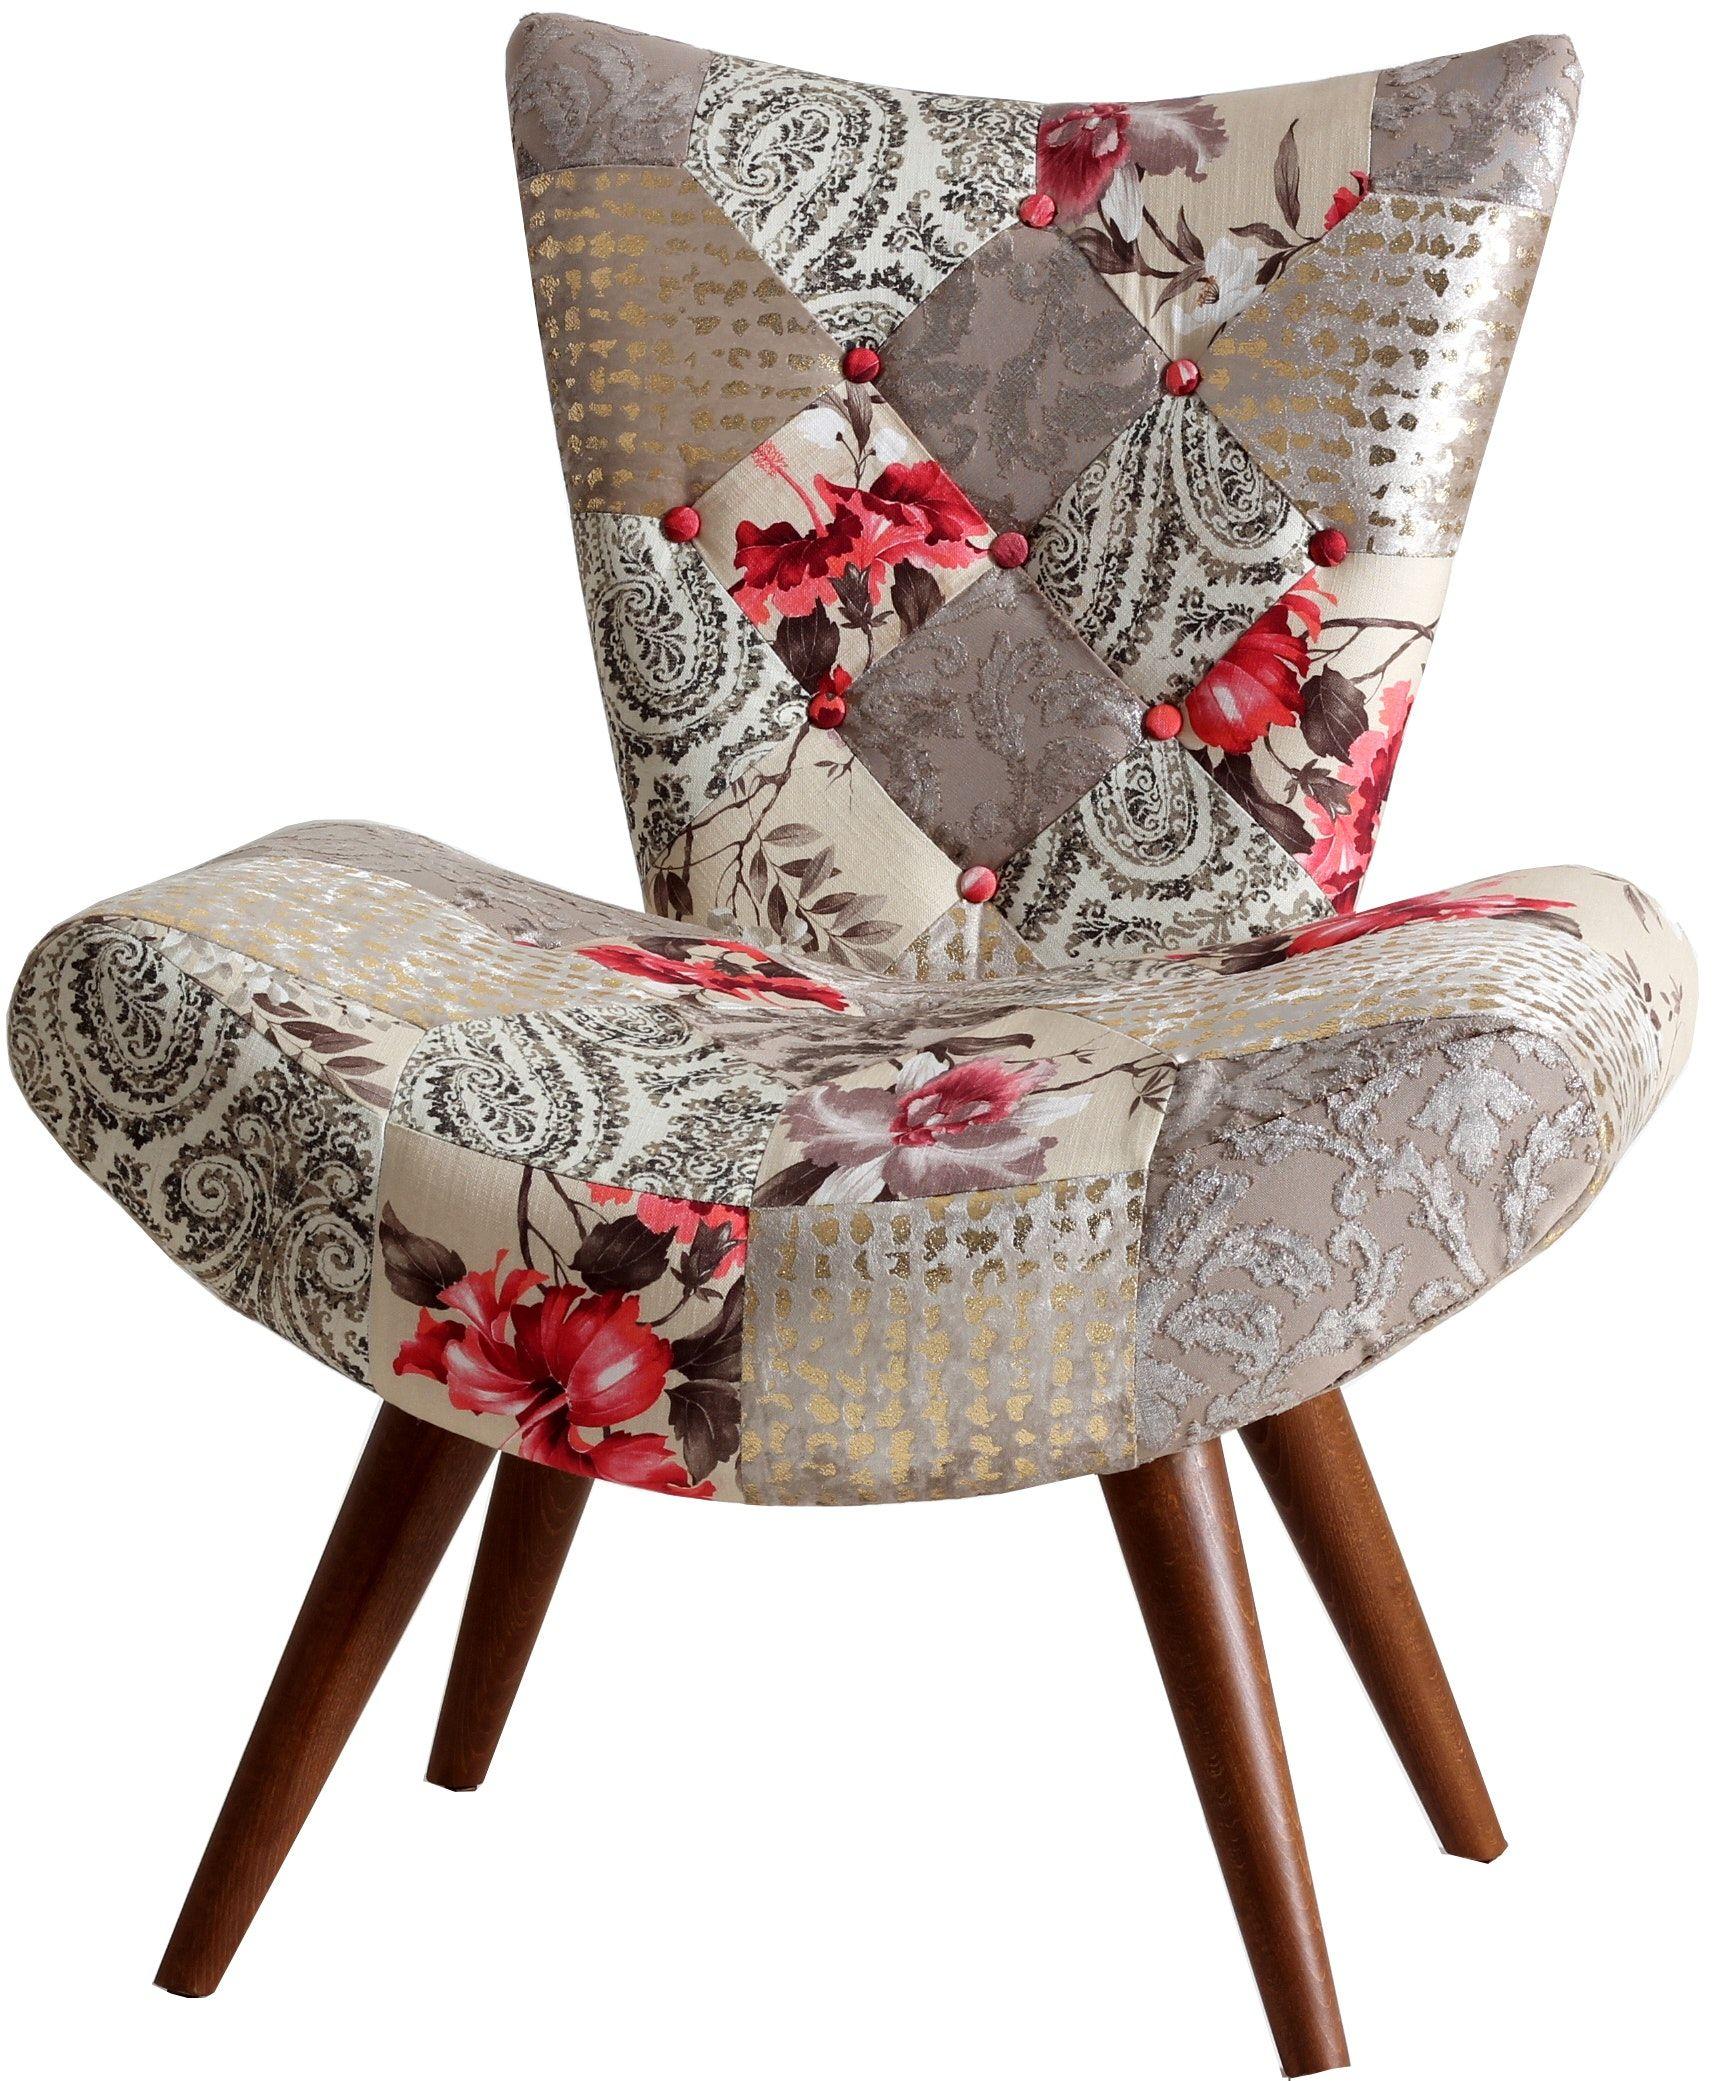 Papaki an easy comfortable chair decor ideas pinterest chair